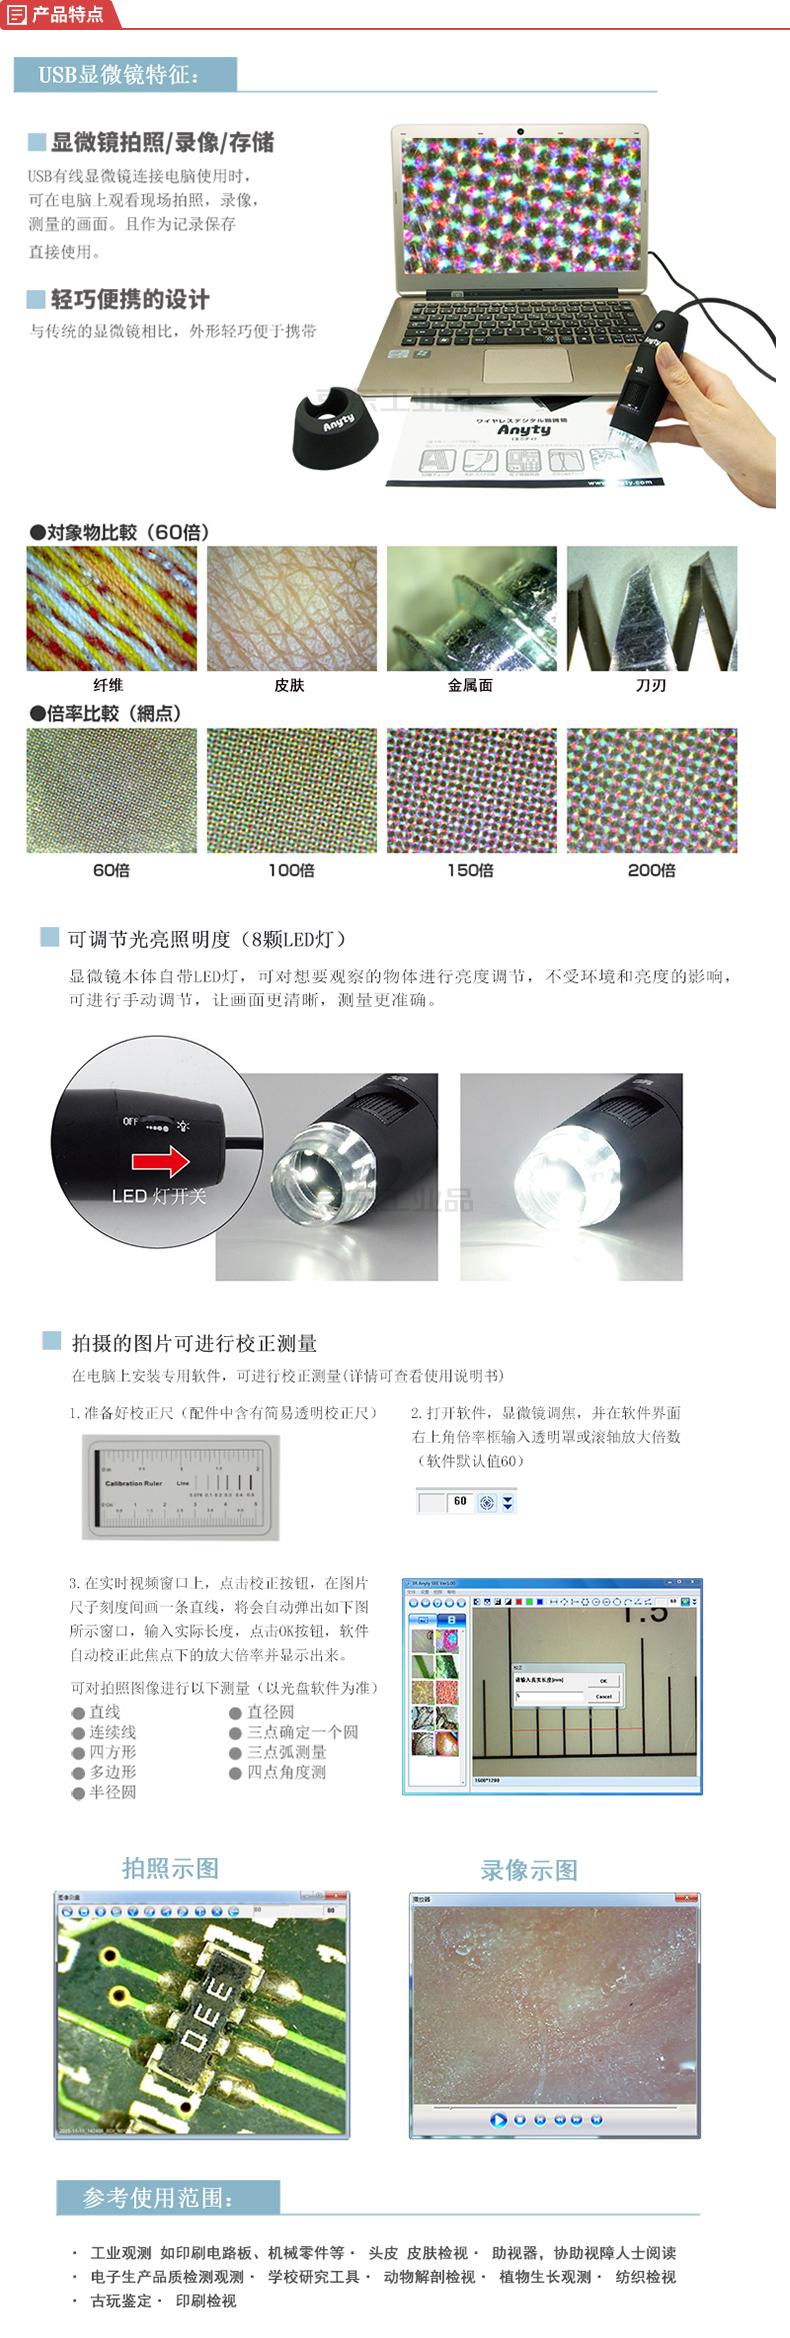 艾尼提(Anyty) 有线USB便携显微镜(10-200倍);3R-MSUSB401